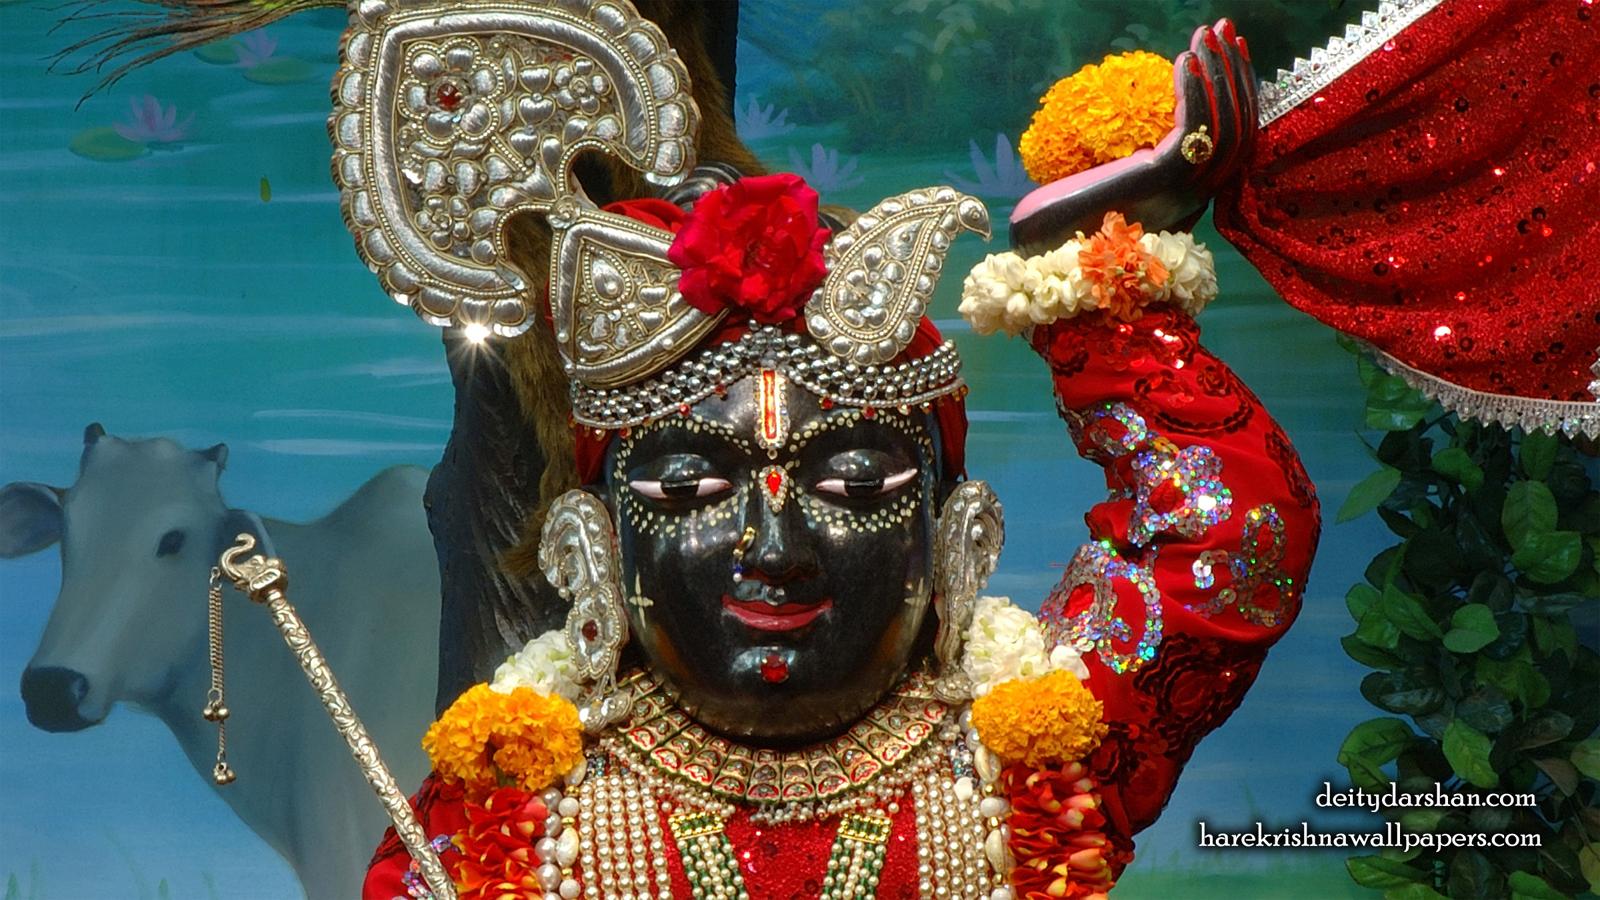 Sri Gopal Close up Wallpaper (053) Size 1600x900 Download